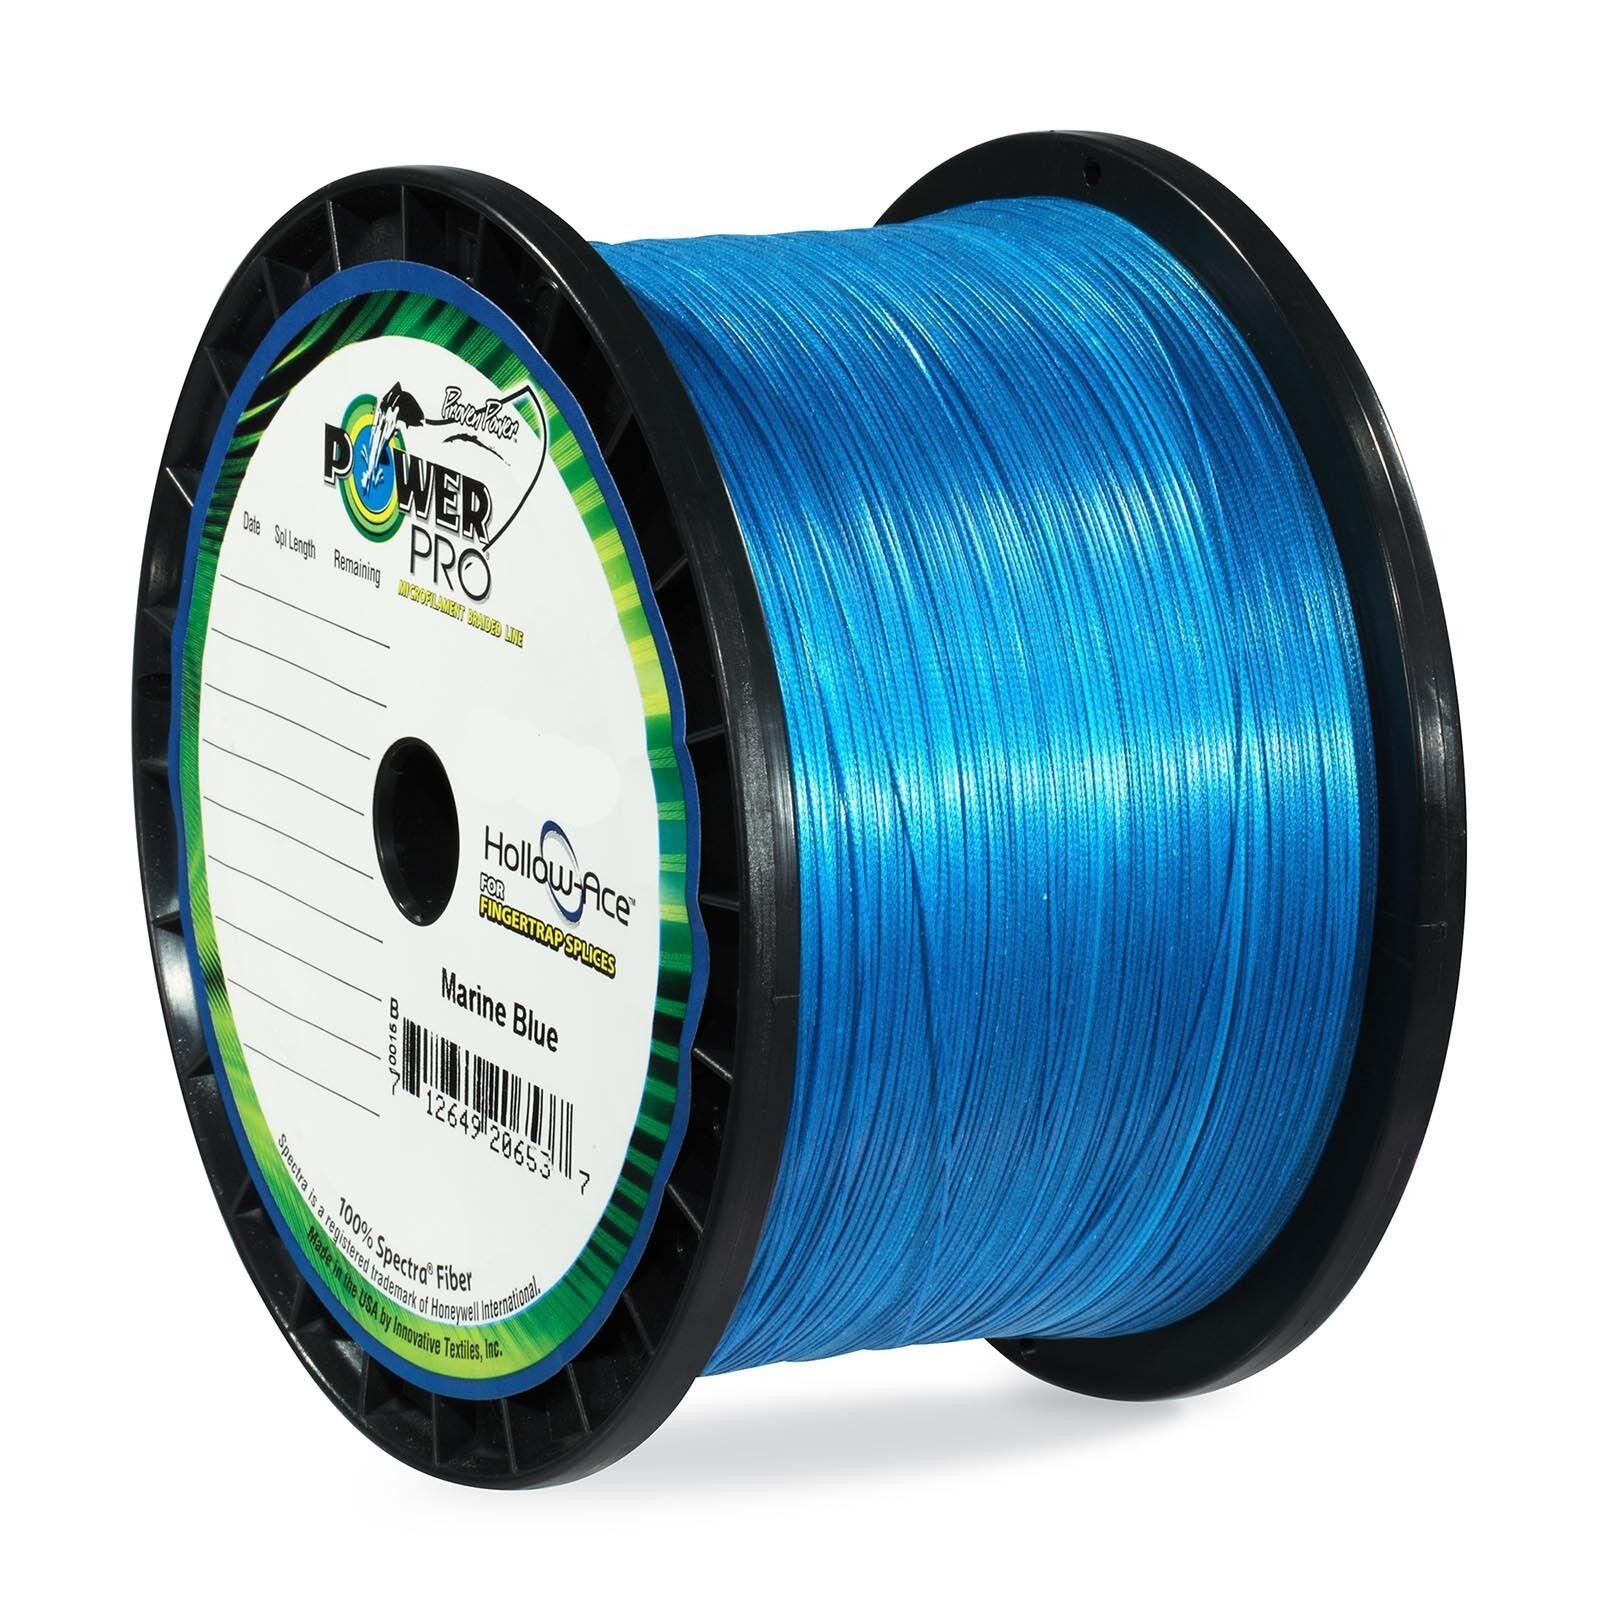 PowerPro Hollow Ace Braided Line 40lb 500yd Spool bluee